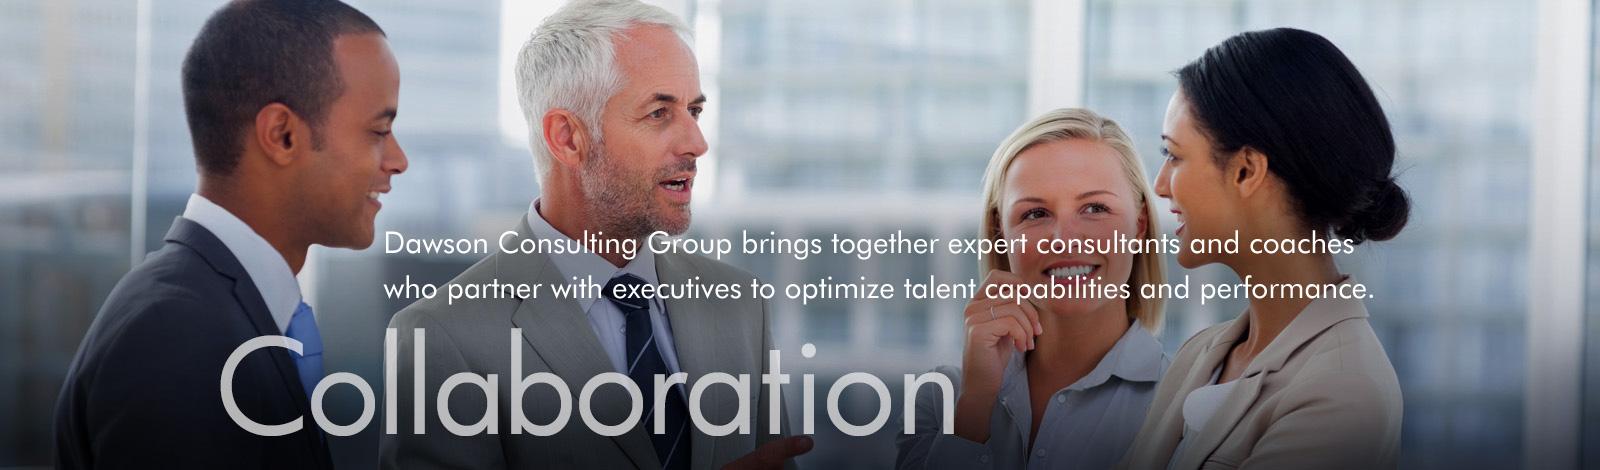 slideDAWSON_collaboration_b